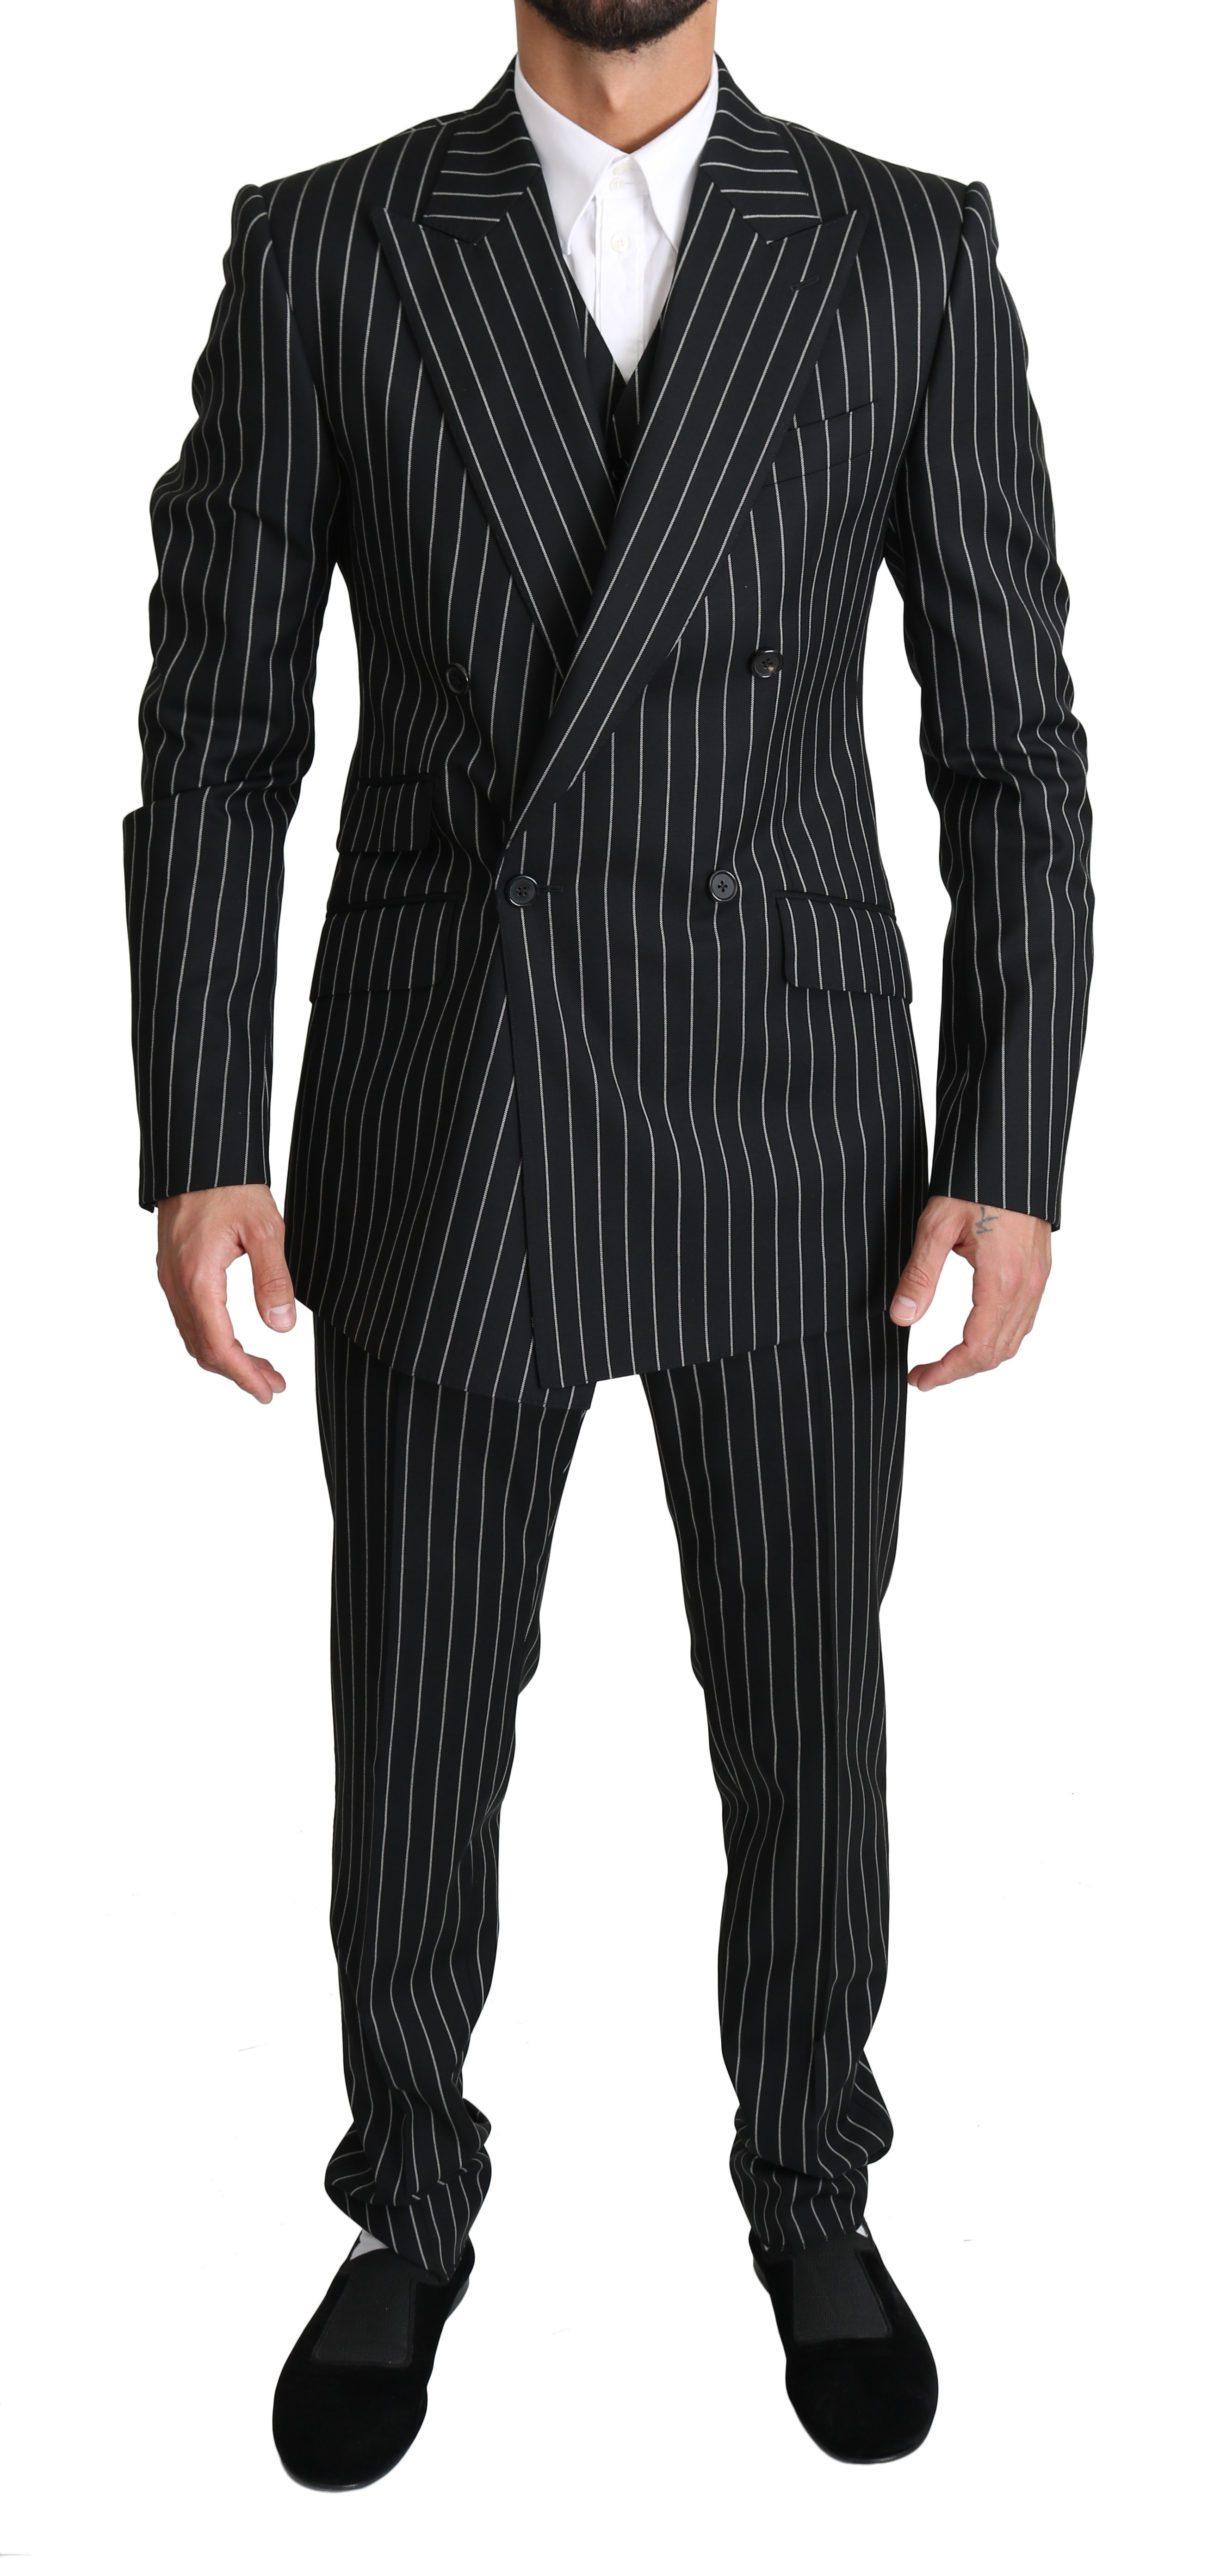 Dolce & Gabbana Men's Striped 3 Piece SICILIA Suit Beige KOS1525 - IT48 | M